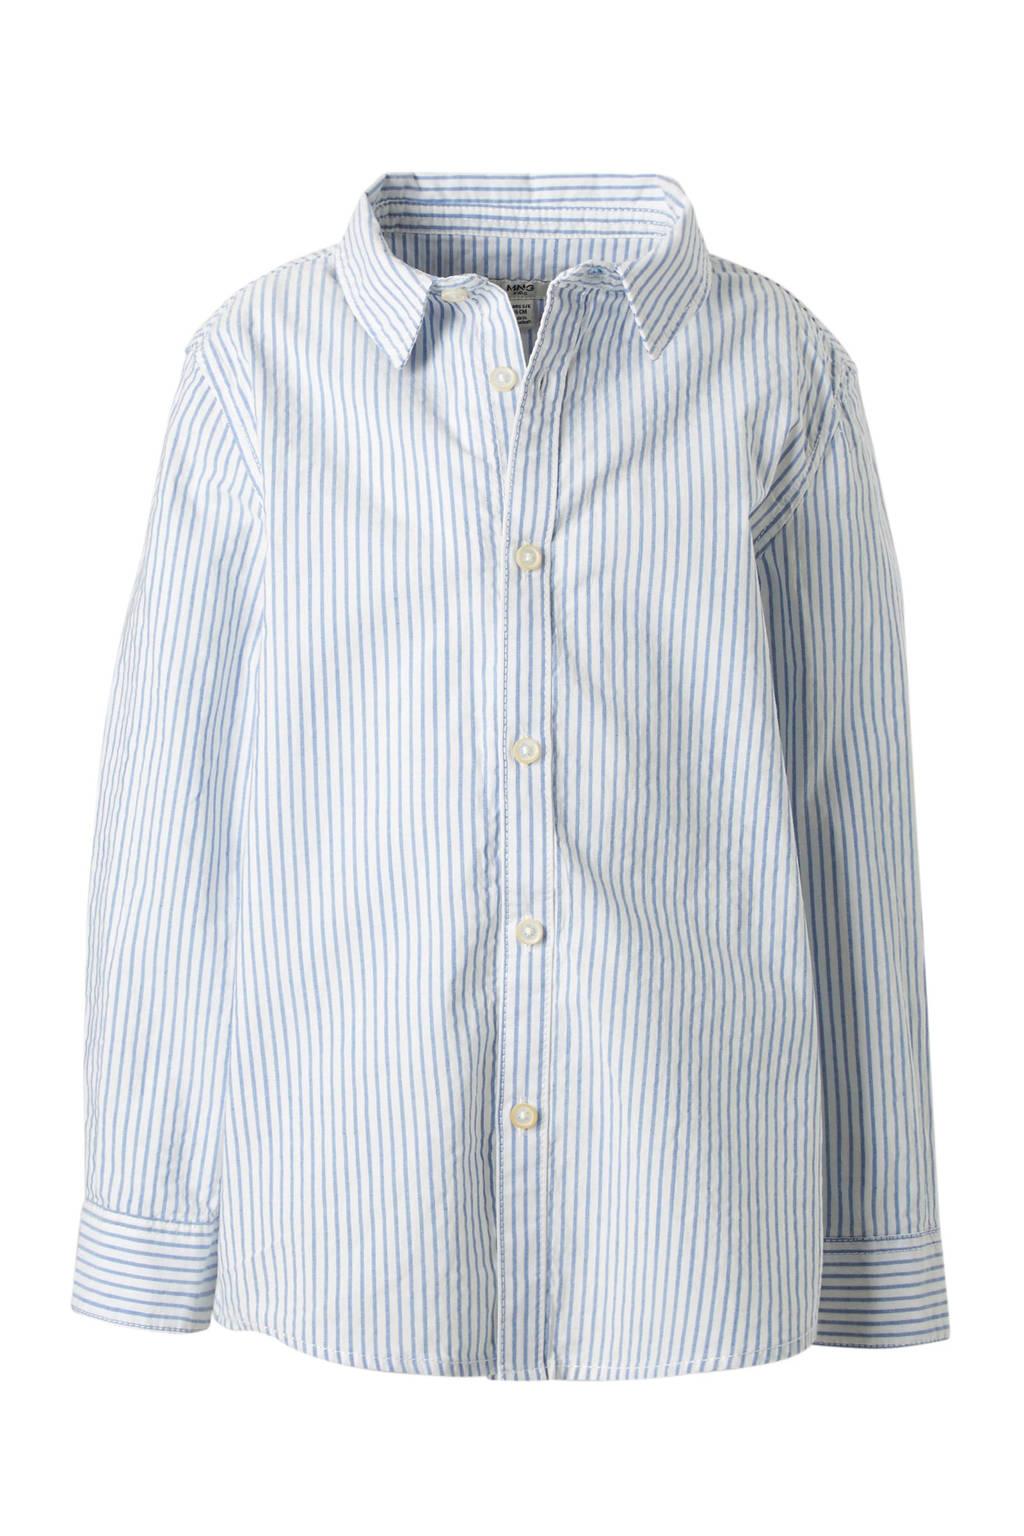 Gestreept Overhemd.Mango Kids Gestreept Overhemd Wit Wehkamp